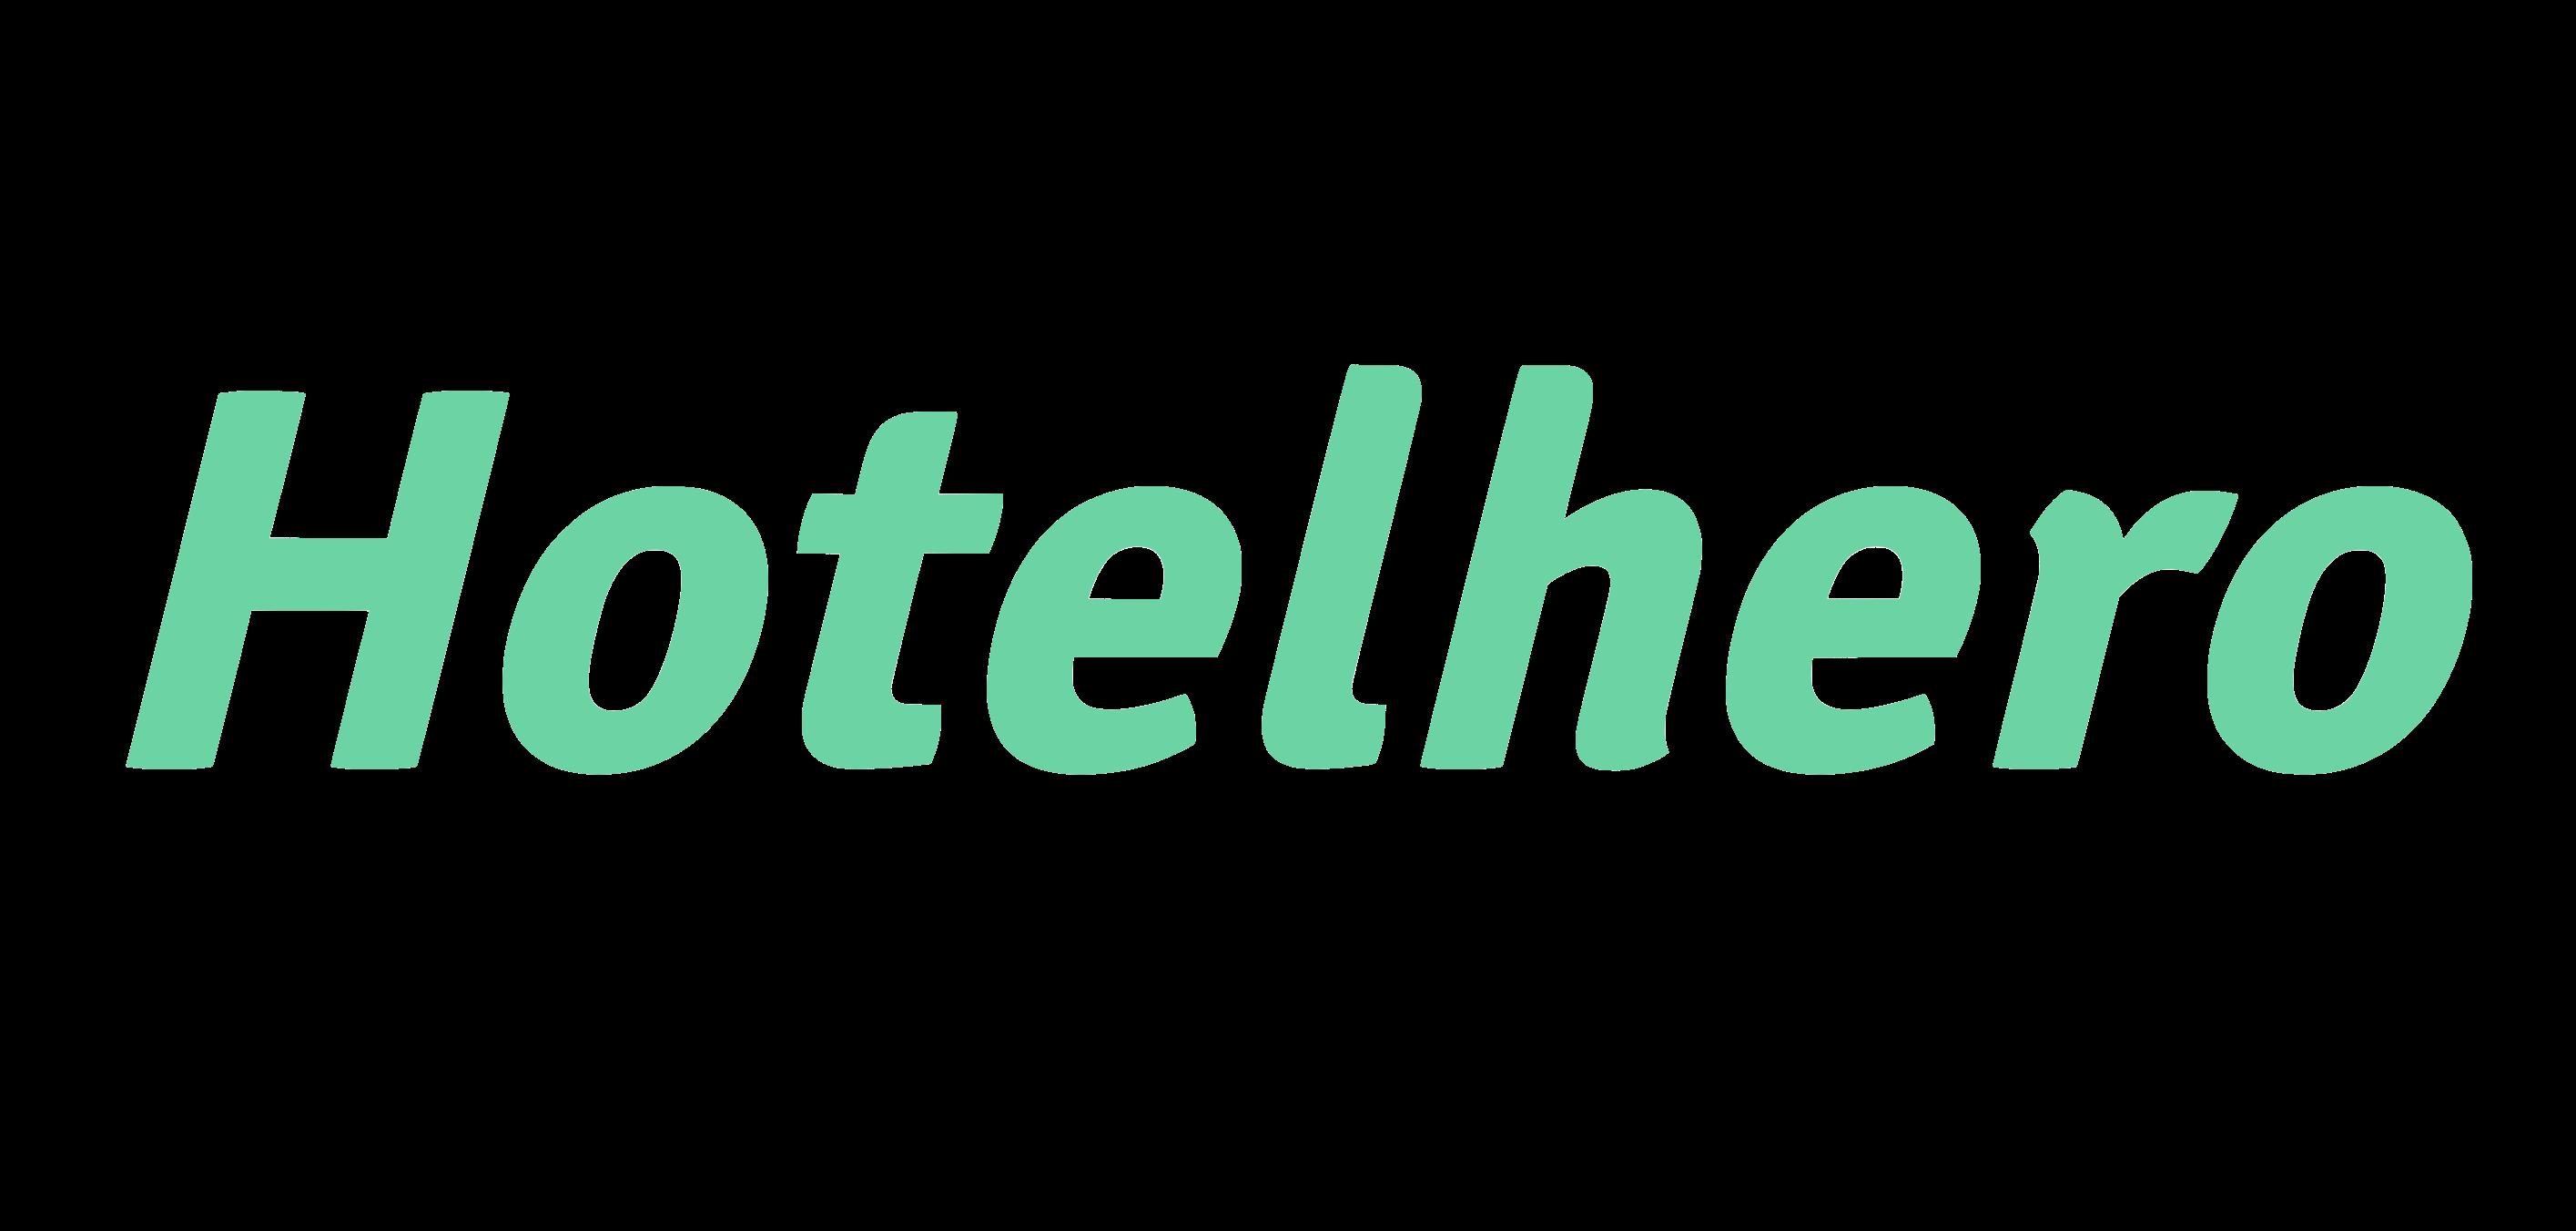 Hotelhero logo.png